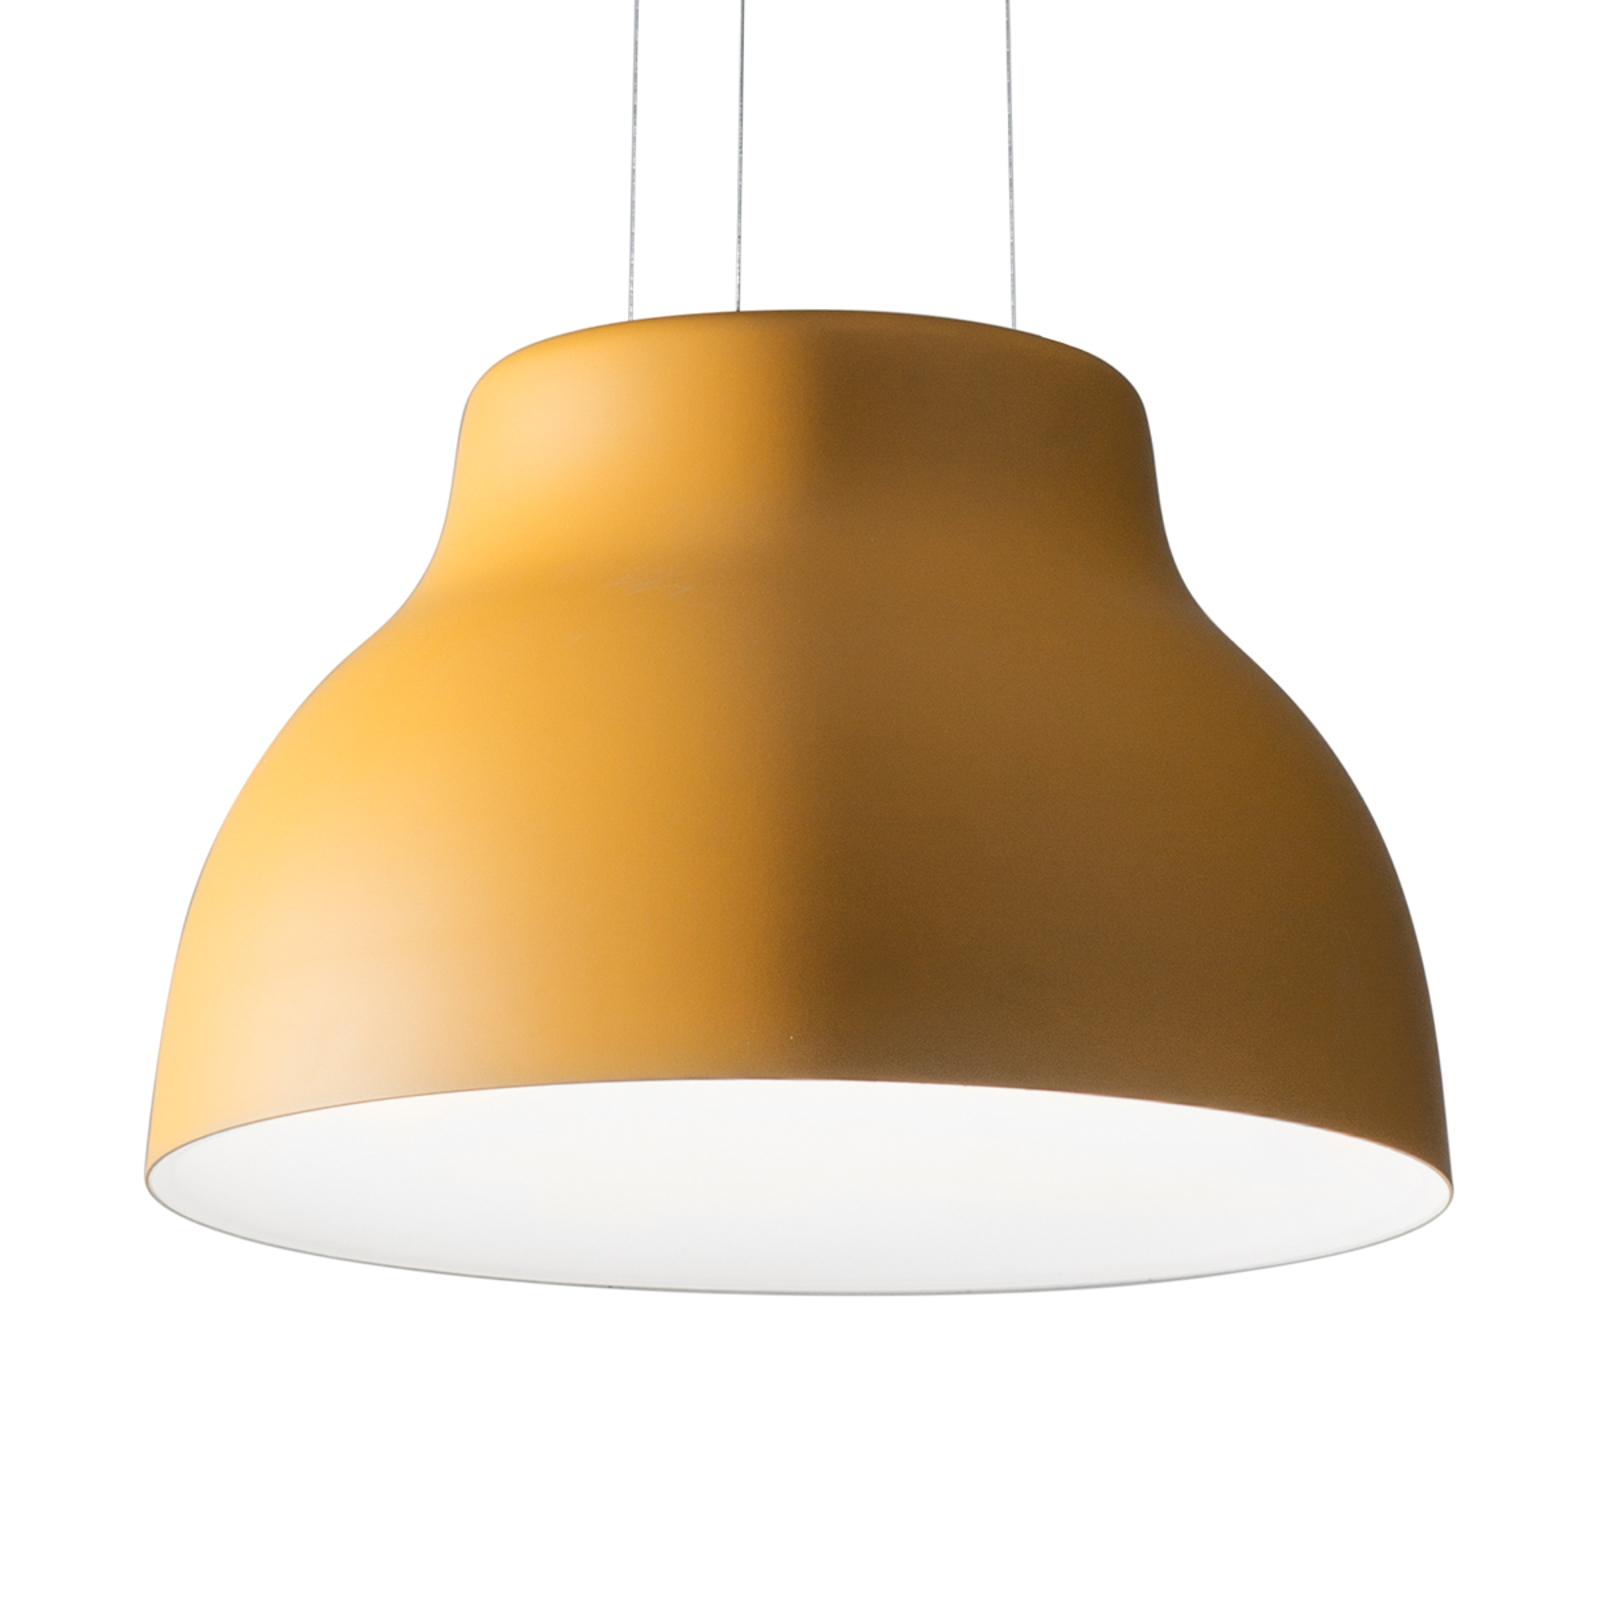 Martinelli Luce Cicala - LED hanglamp, geel